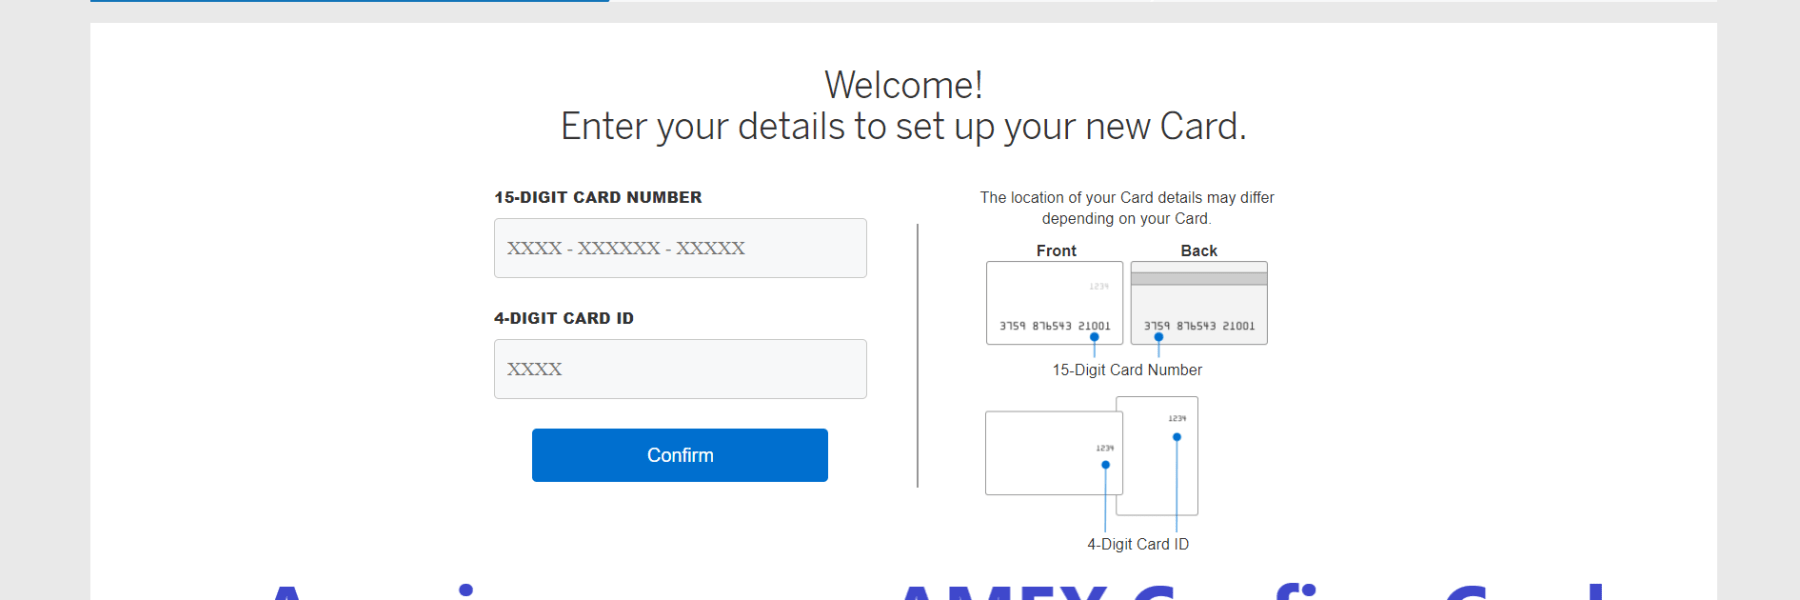 Americanexpress Confirm Card, Americanexpress AMEX Confirm Card